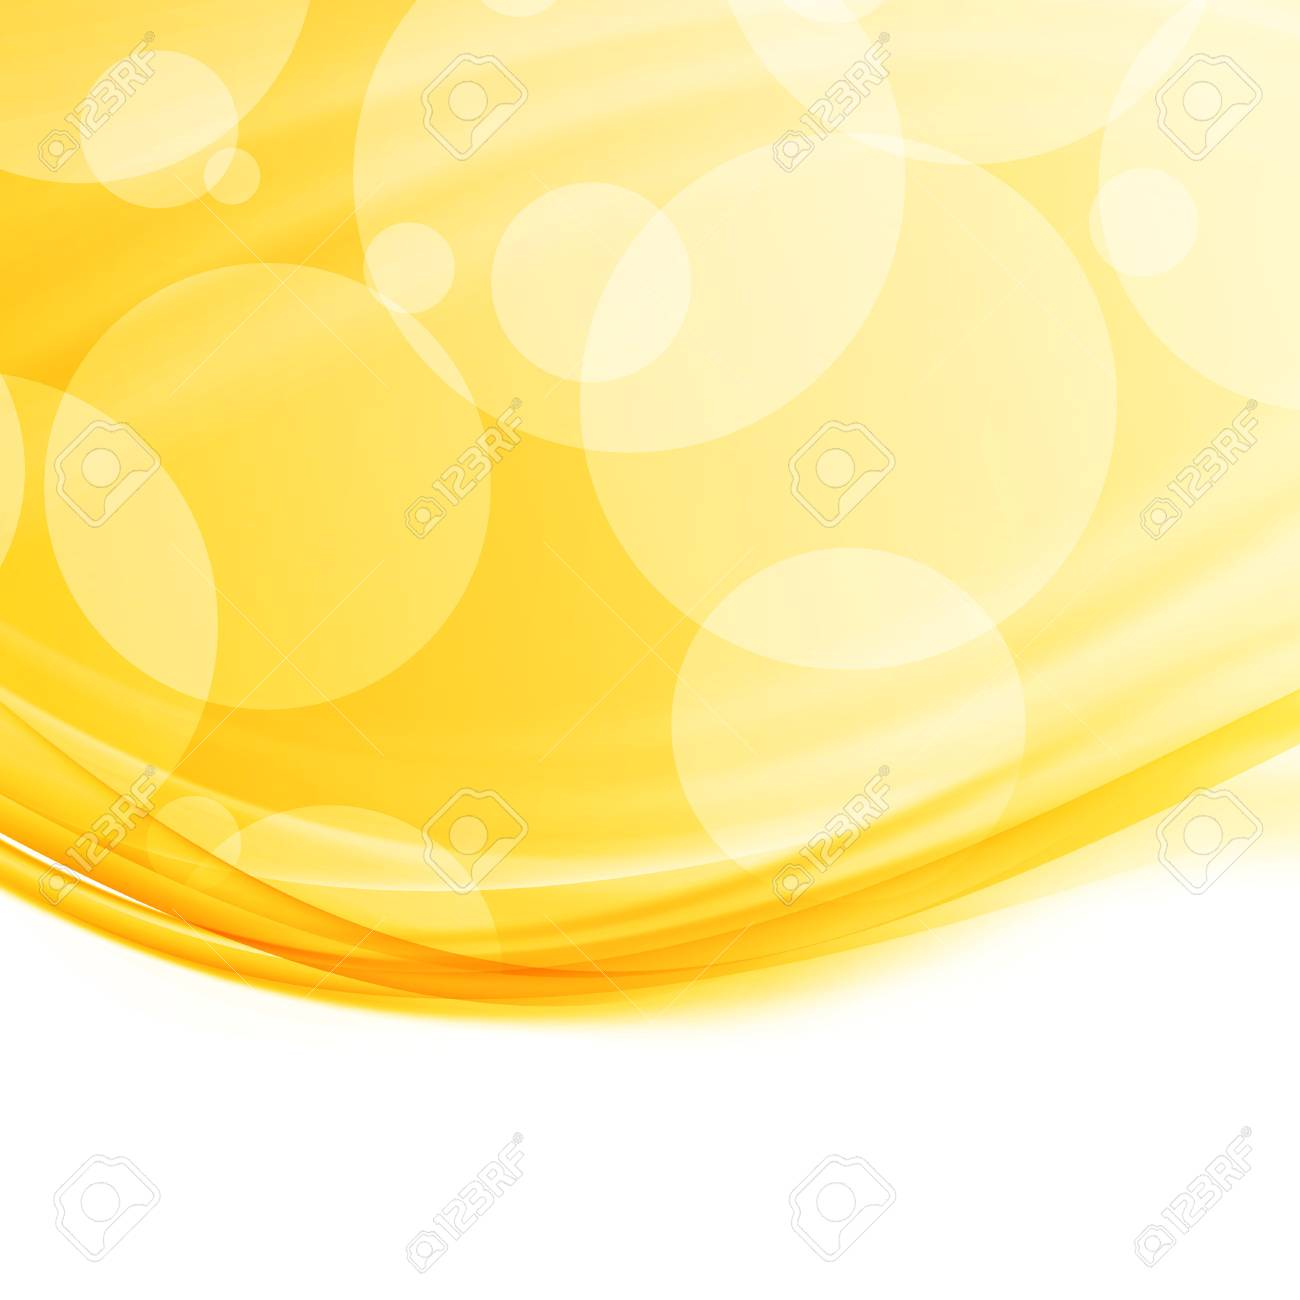 Bright Modern Abstract Orange Swoosh Border Background Design